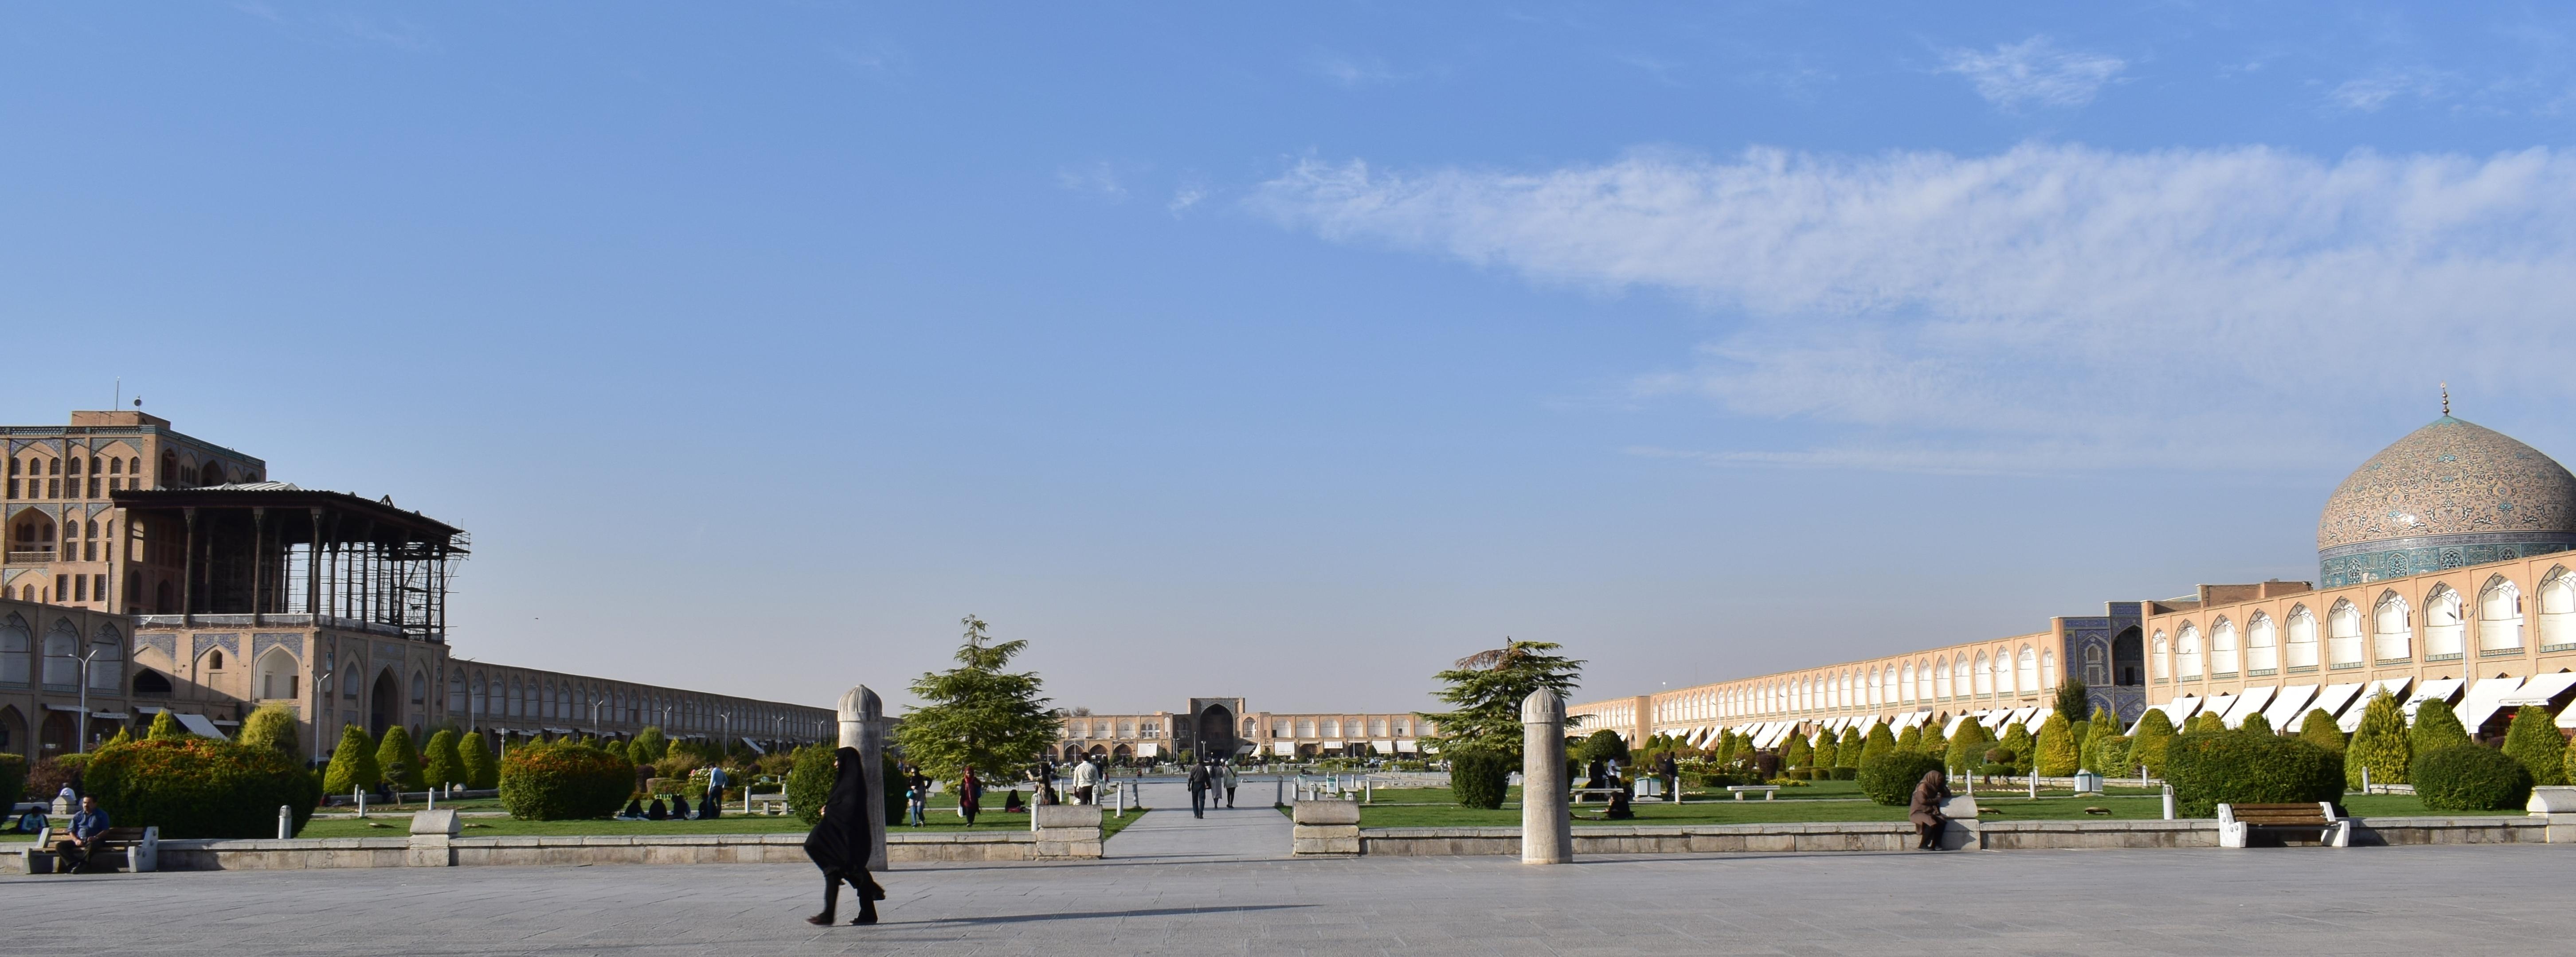 Ispahan place